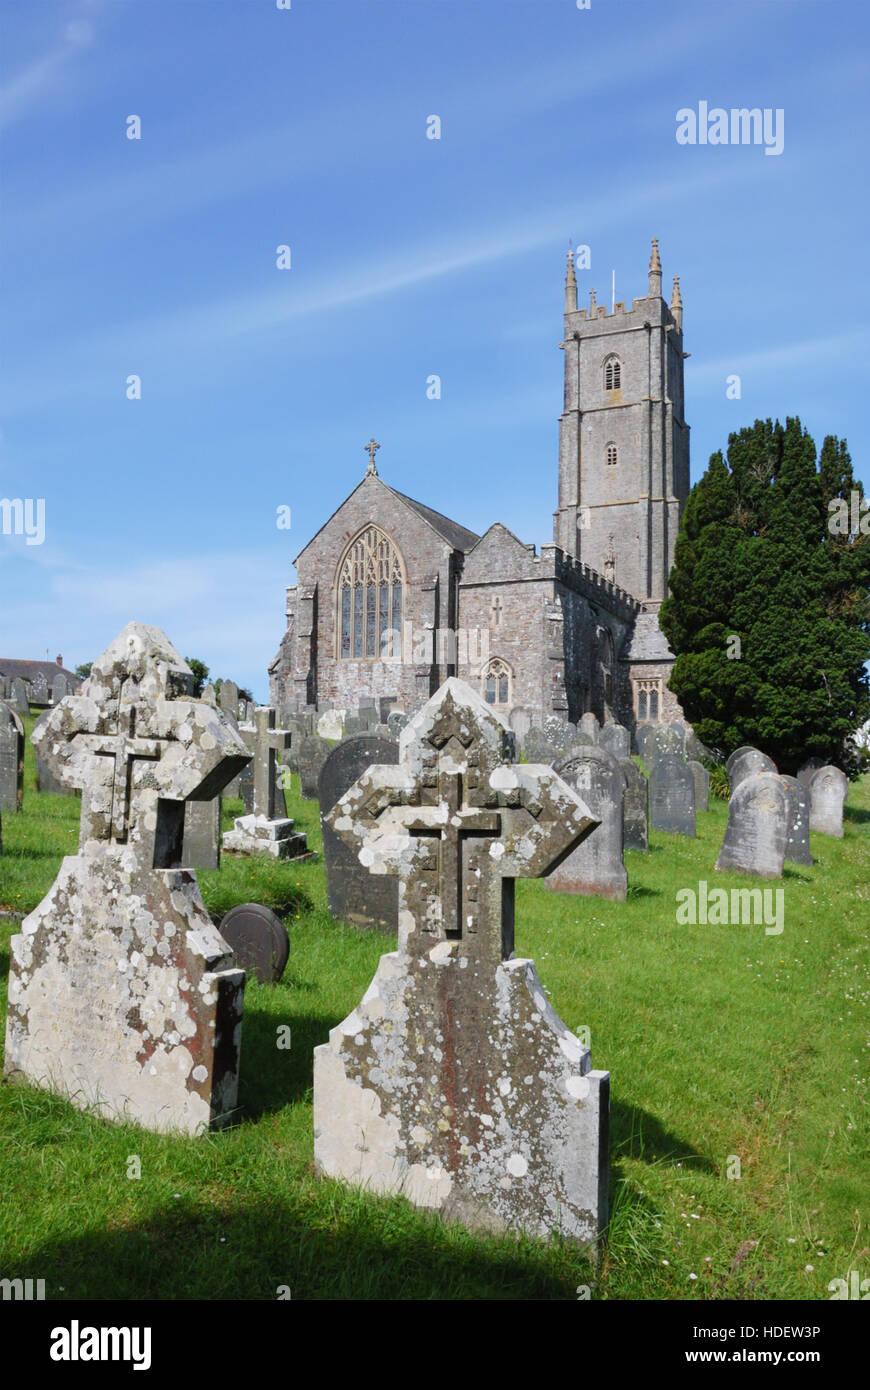 St Nectan's Church at Stoke near Hartland in North Devon Stock Photo